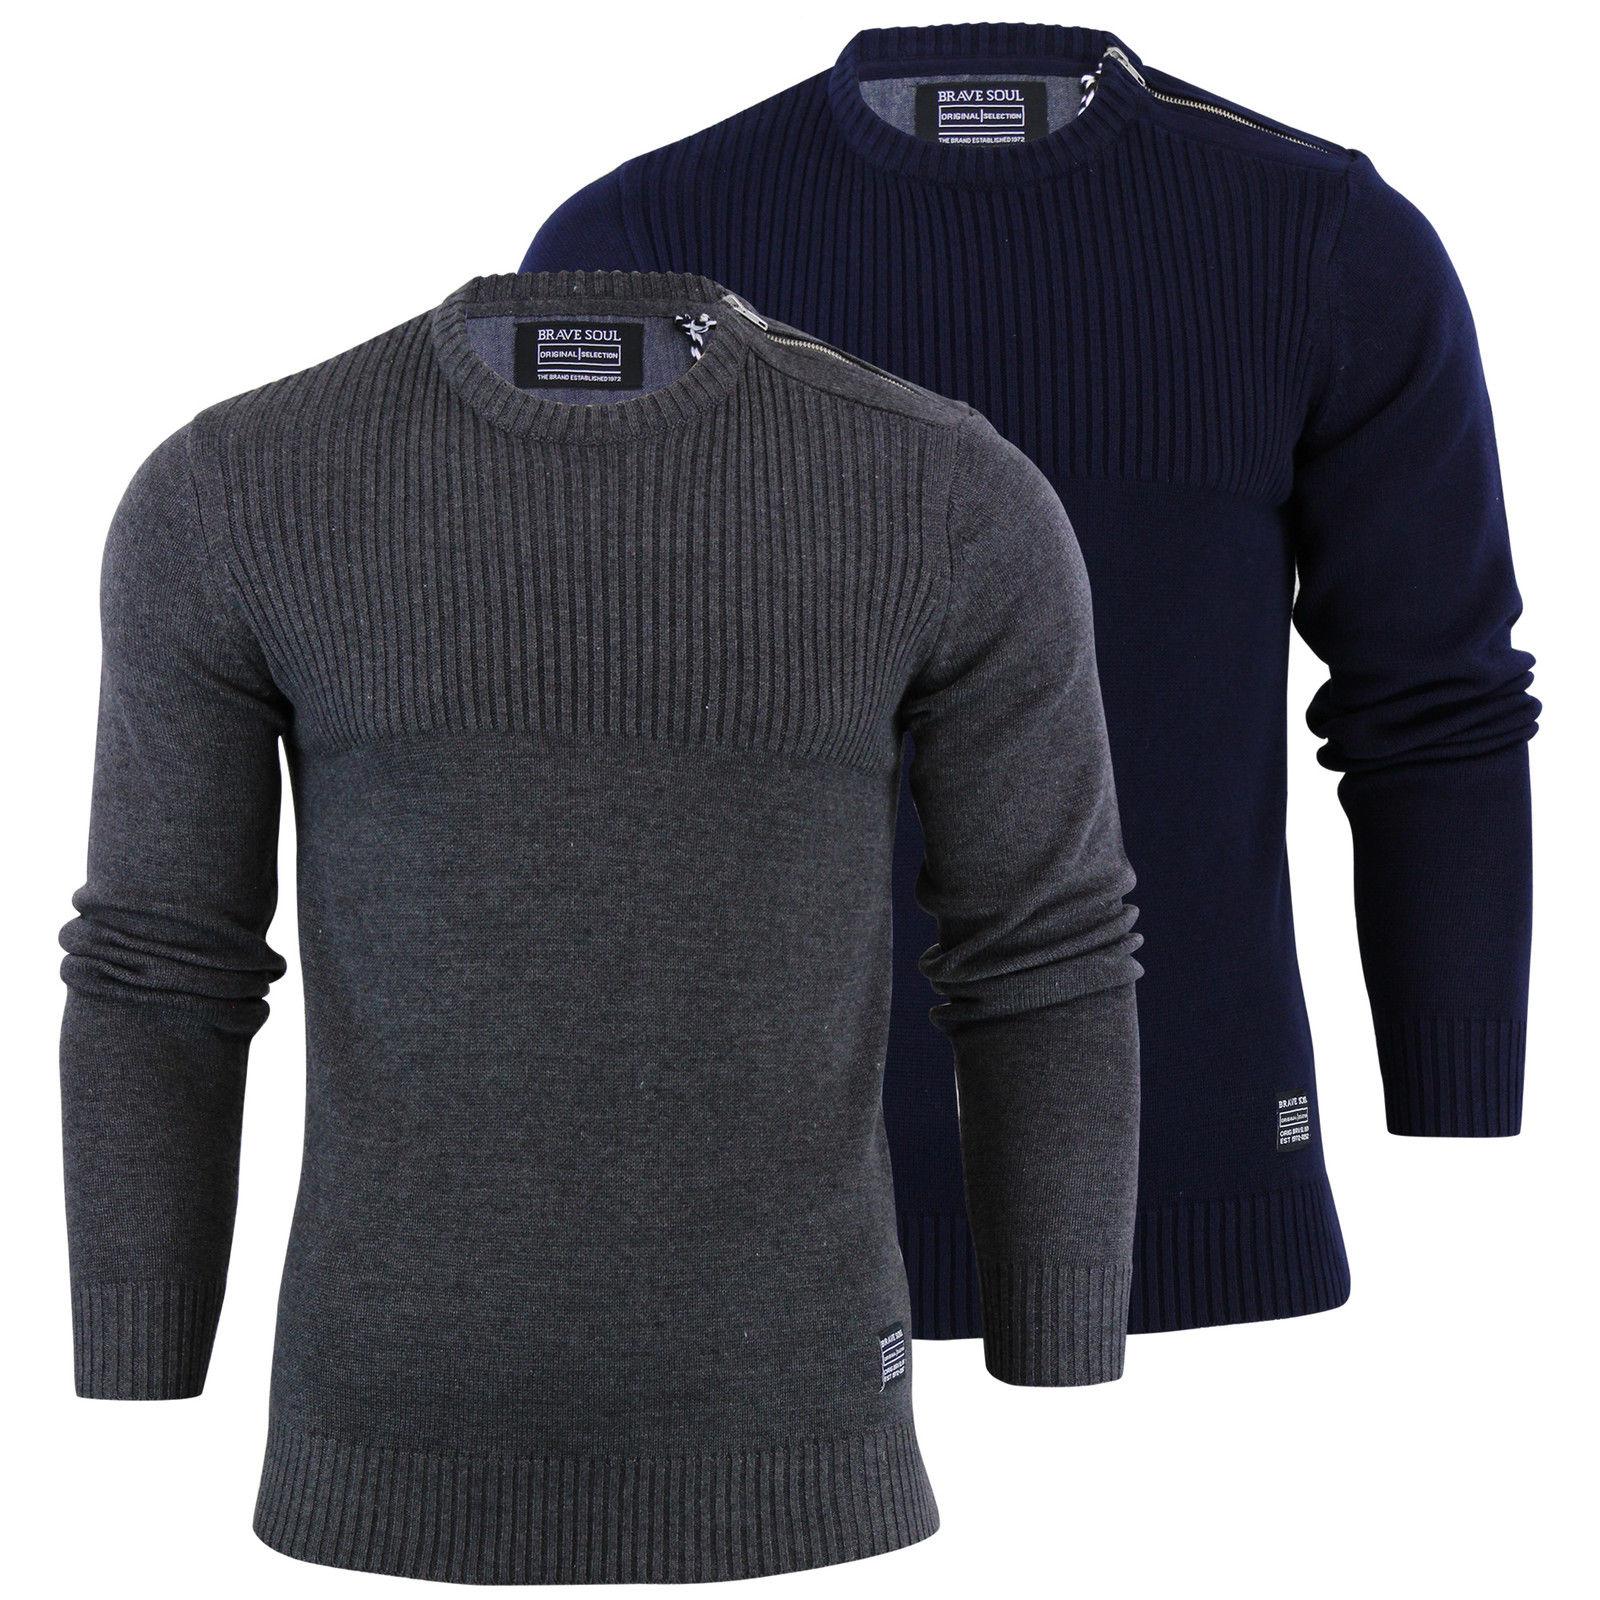 Design Custom Cardigans & Varsity Sweaters in our Online Designer. No Mins or Set Up Fees.